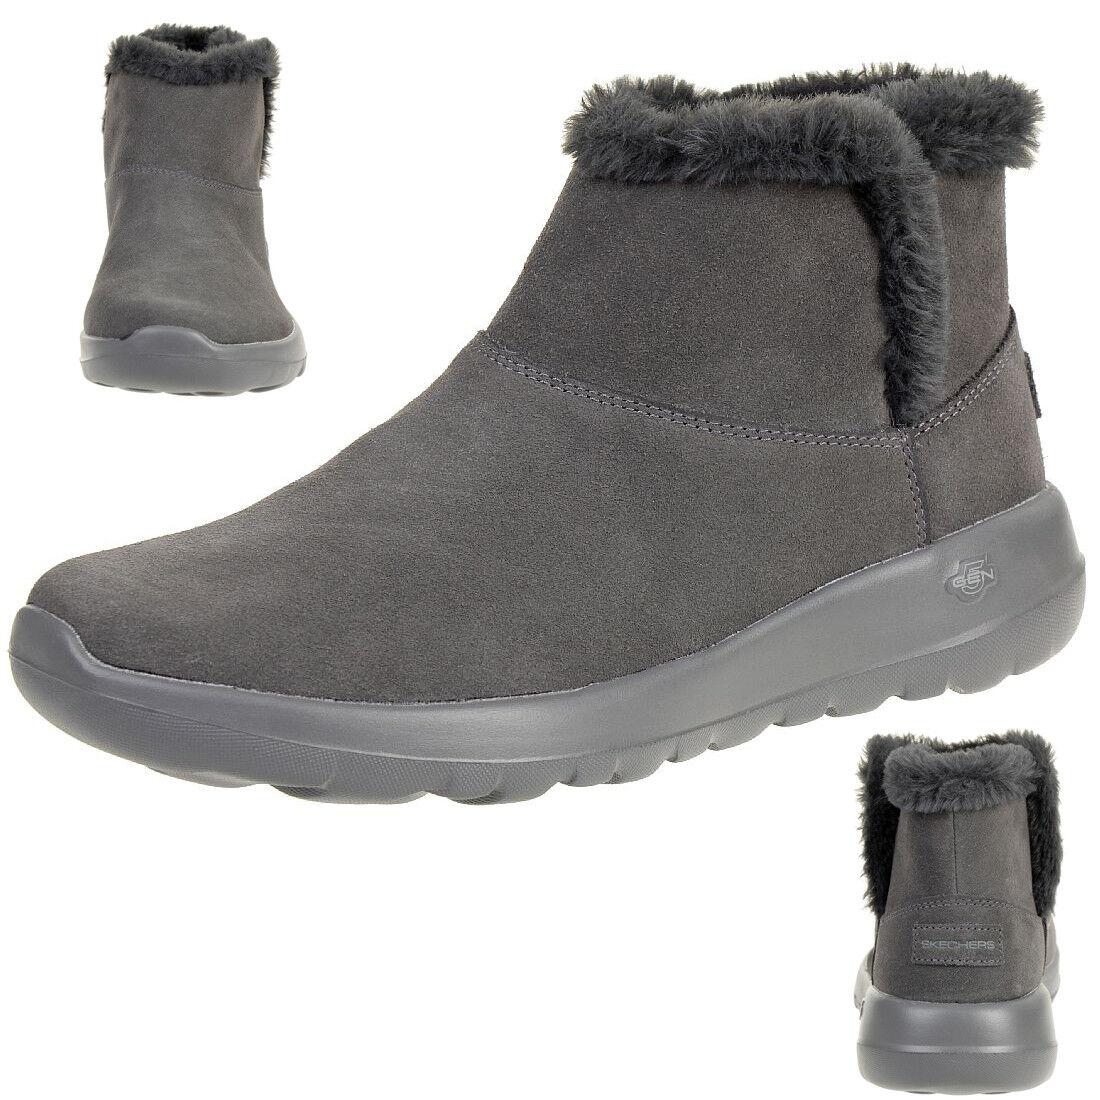 Skechers on the go Joy Bundle up stivali Wouomo Winter scarpe Padded grigio